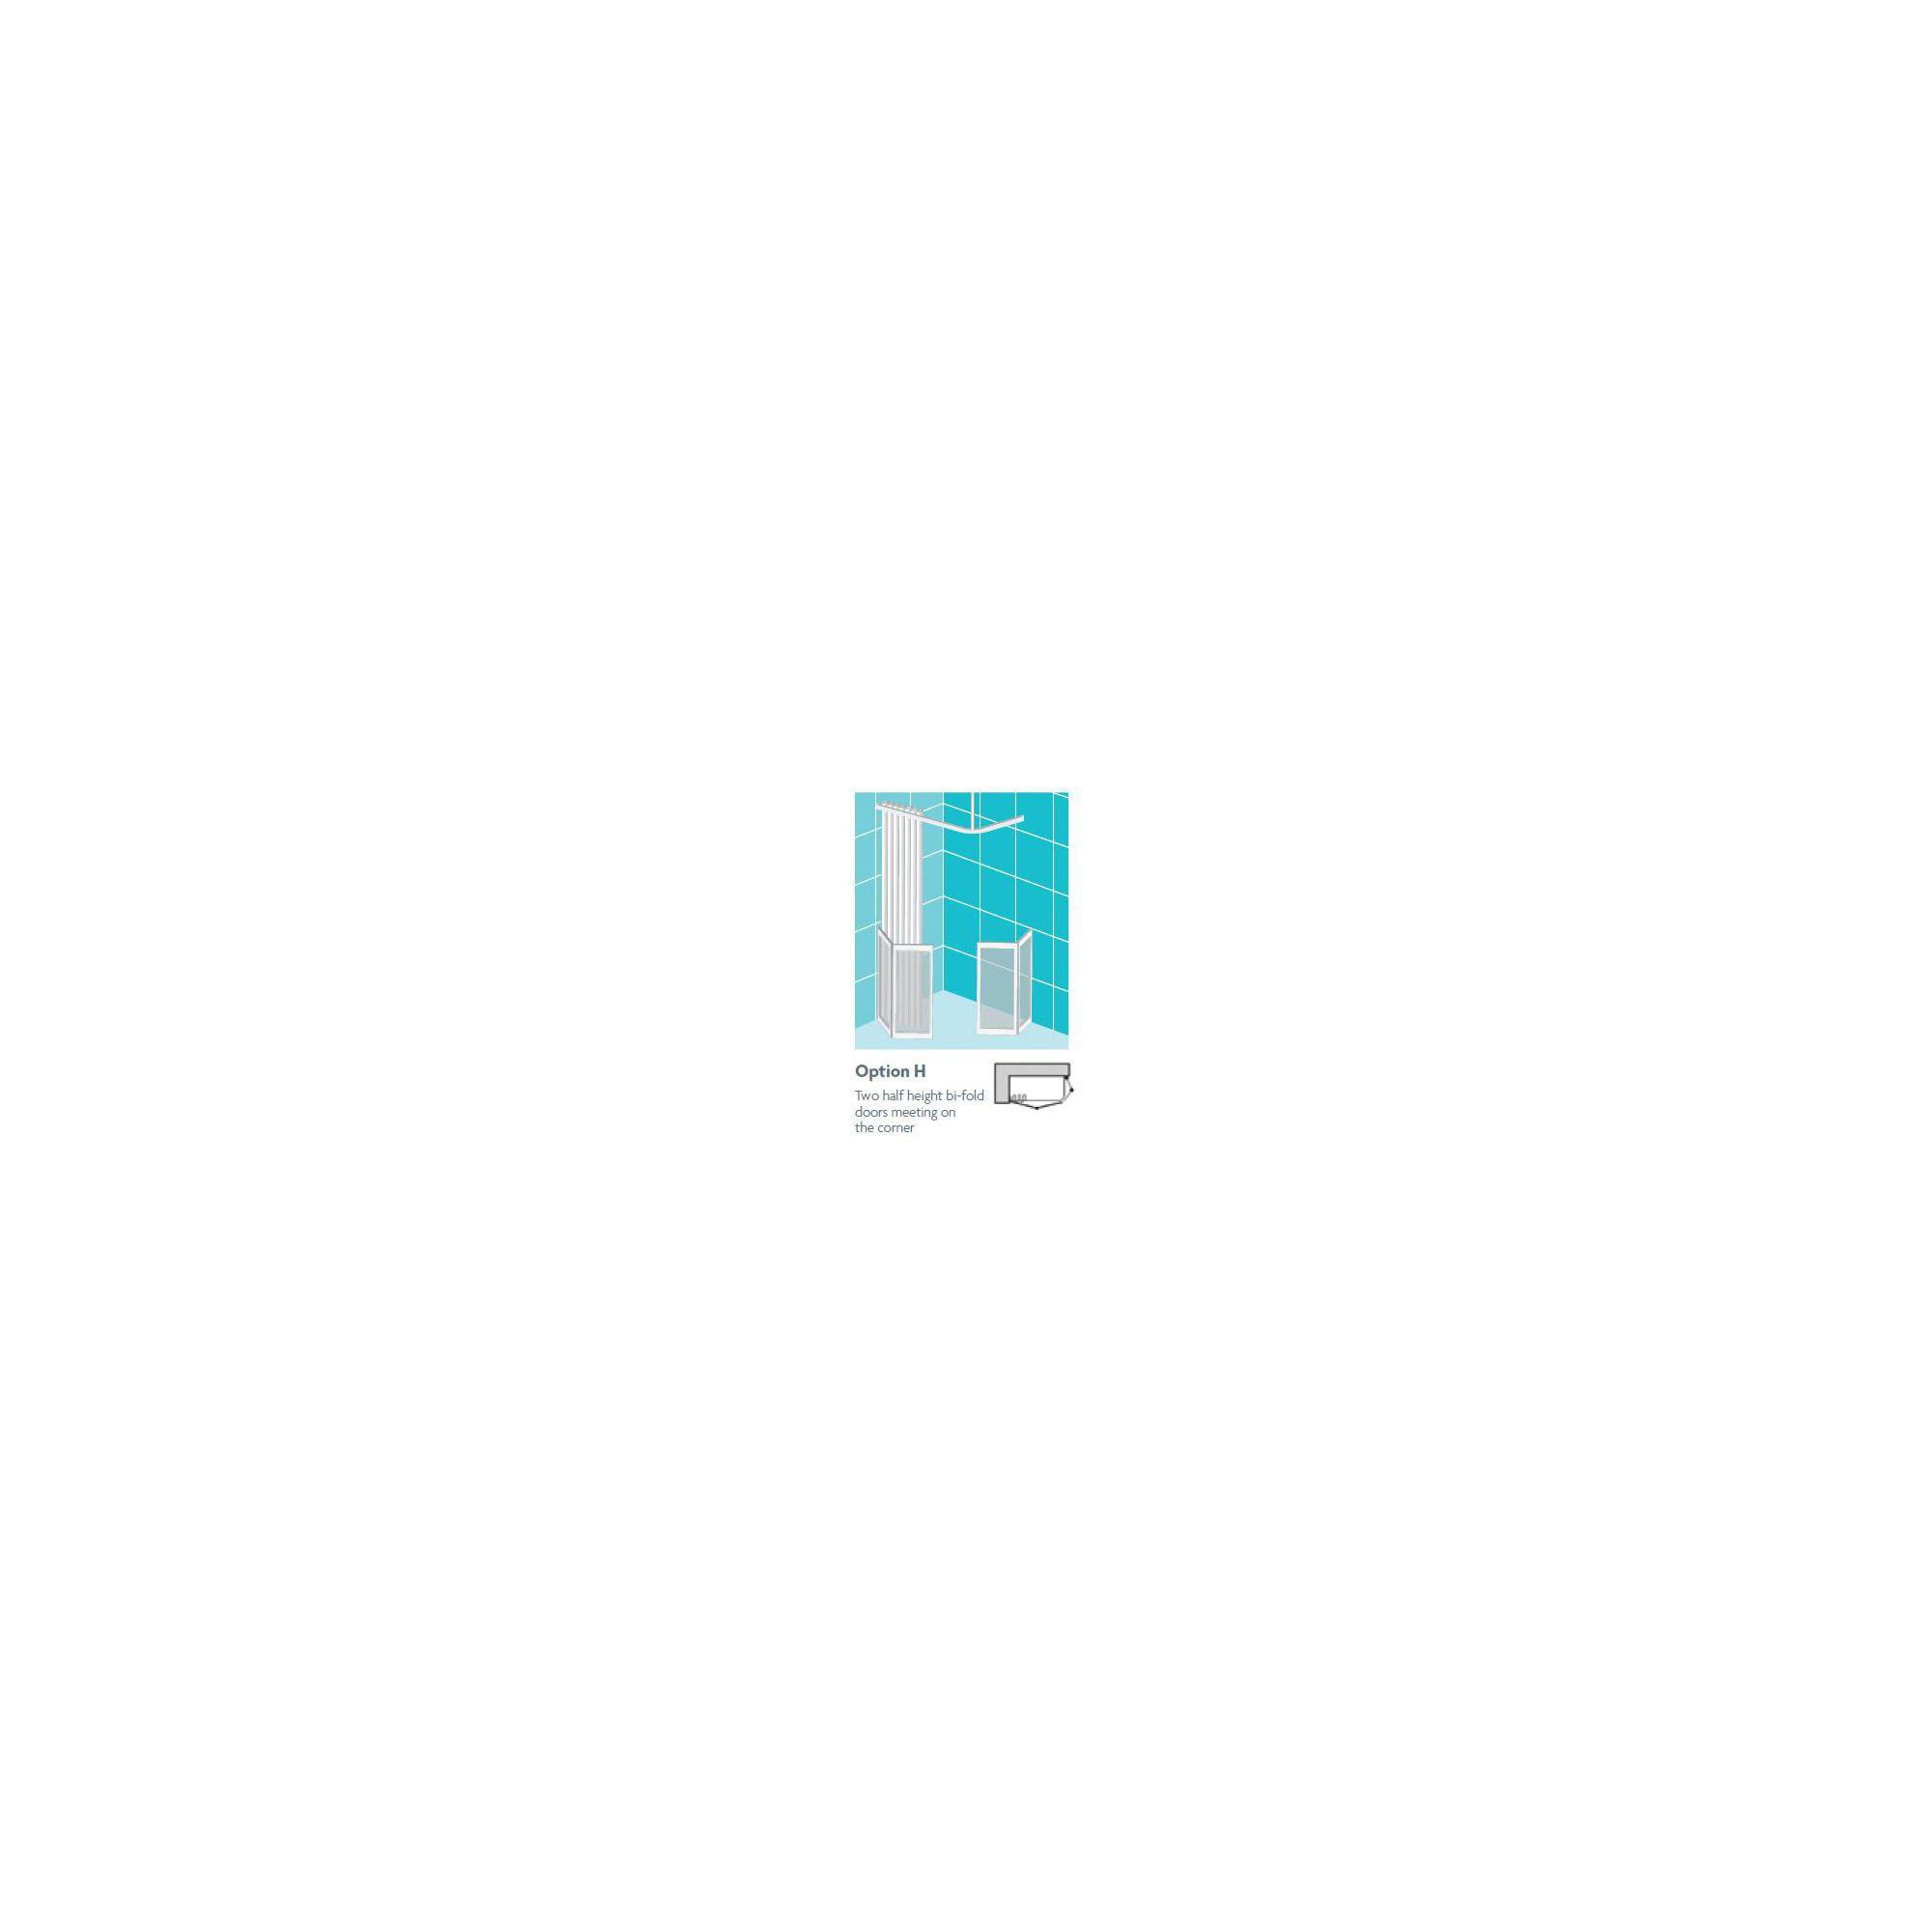 Impey Supreme Corner Door Option H 1050mm x 1050mm at Tesco Direct